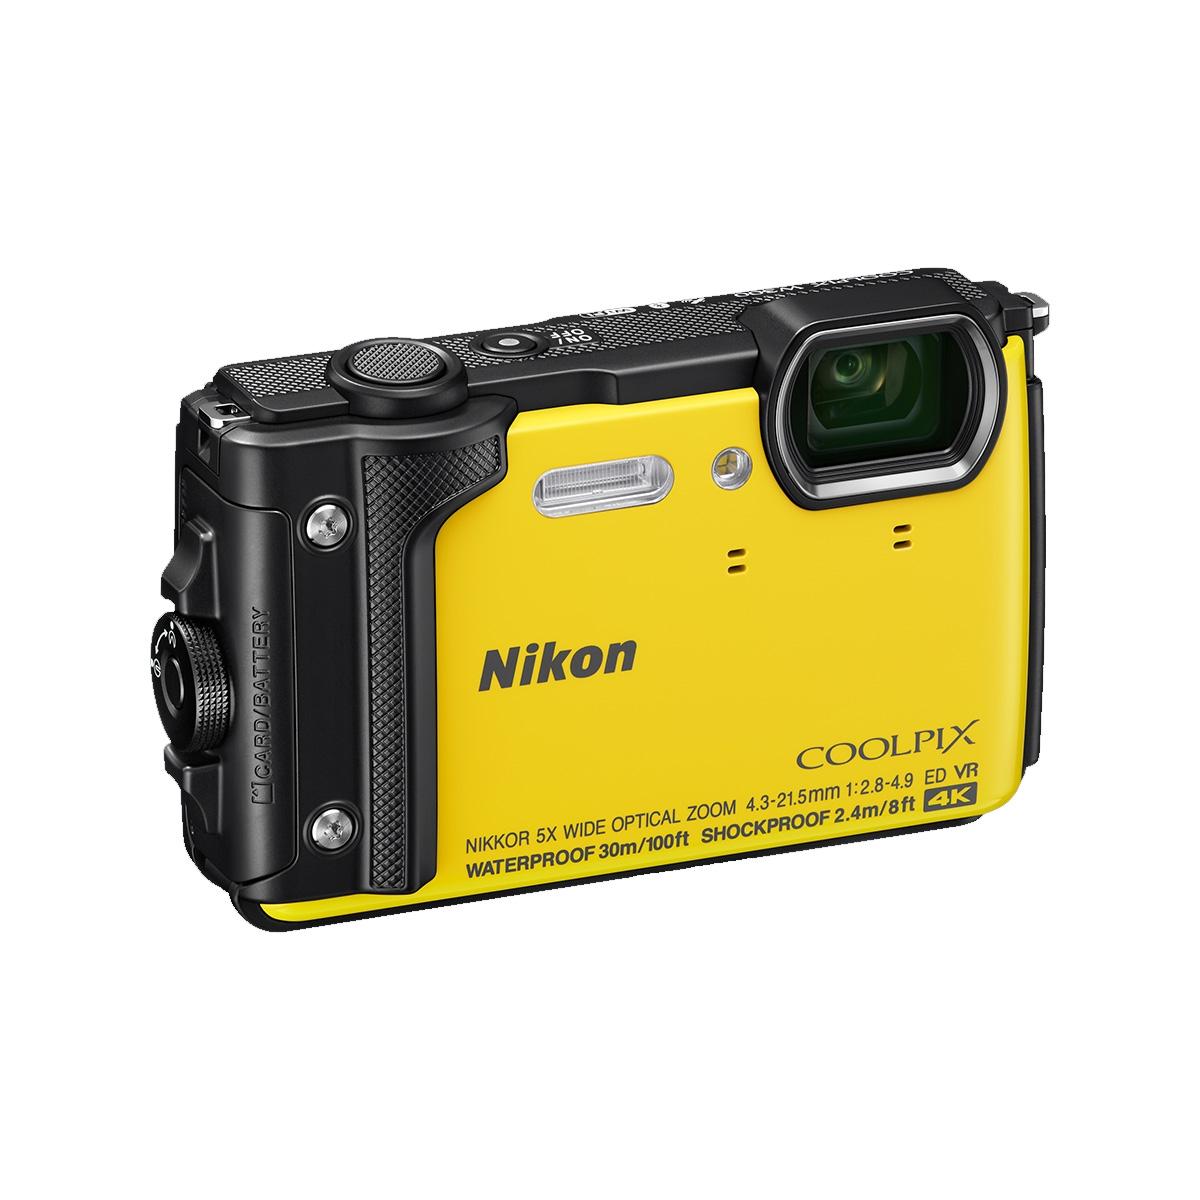 Nikon Coolpix W300 16MP Waterproof Camera - Yellow | Uttings.co.uk